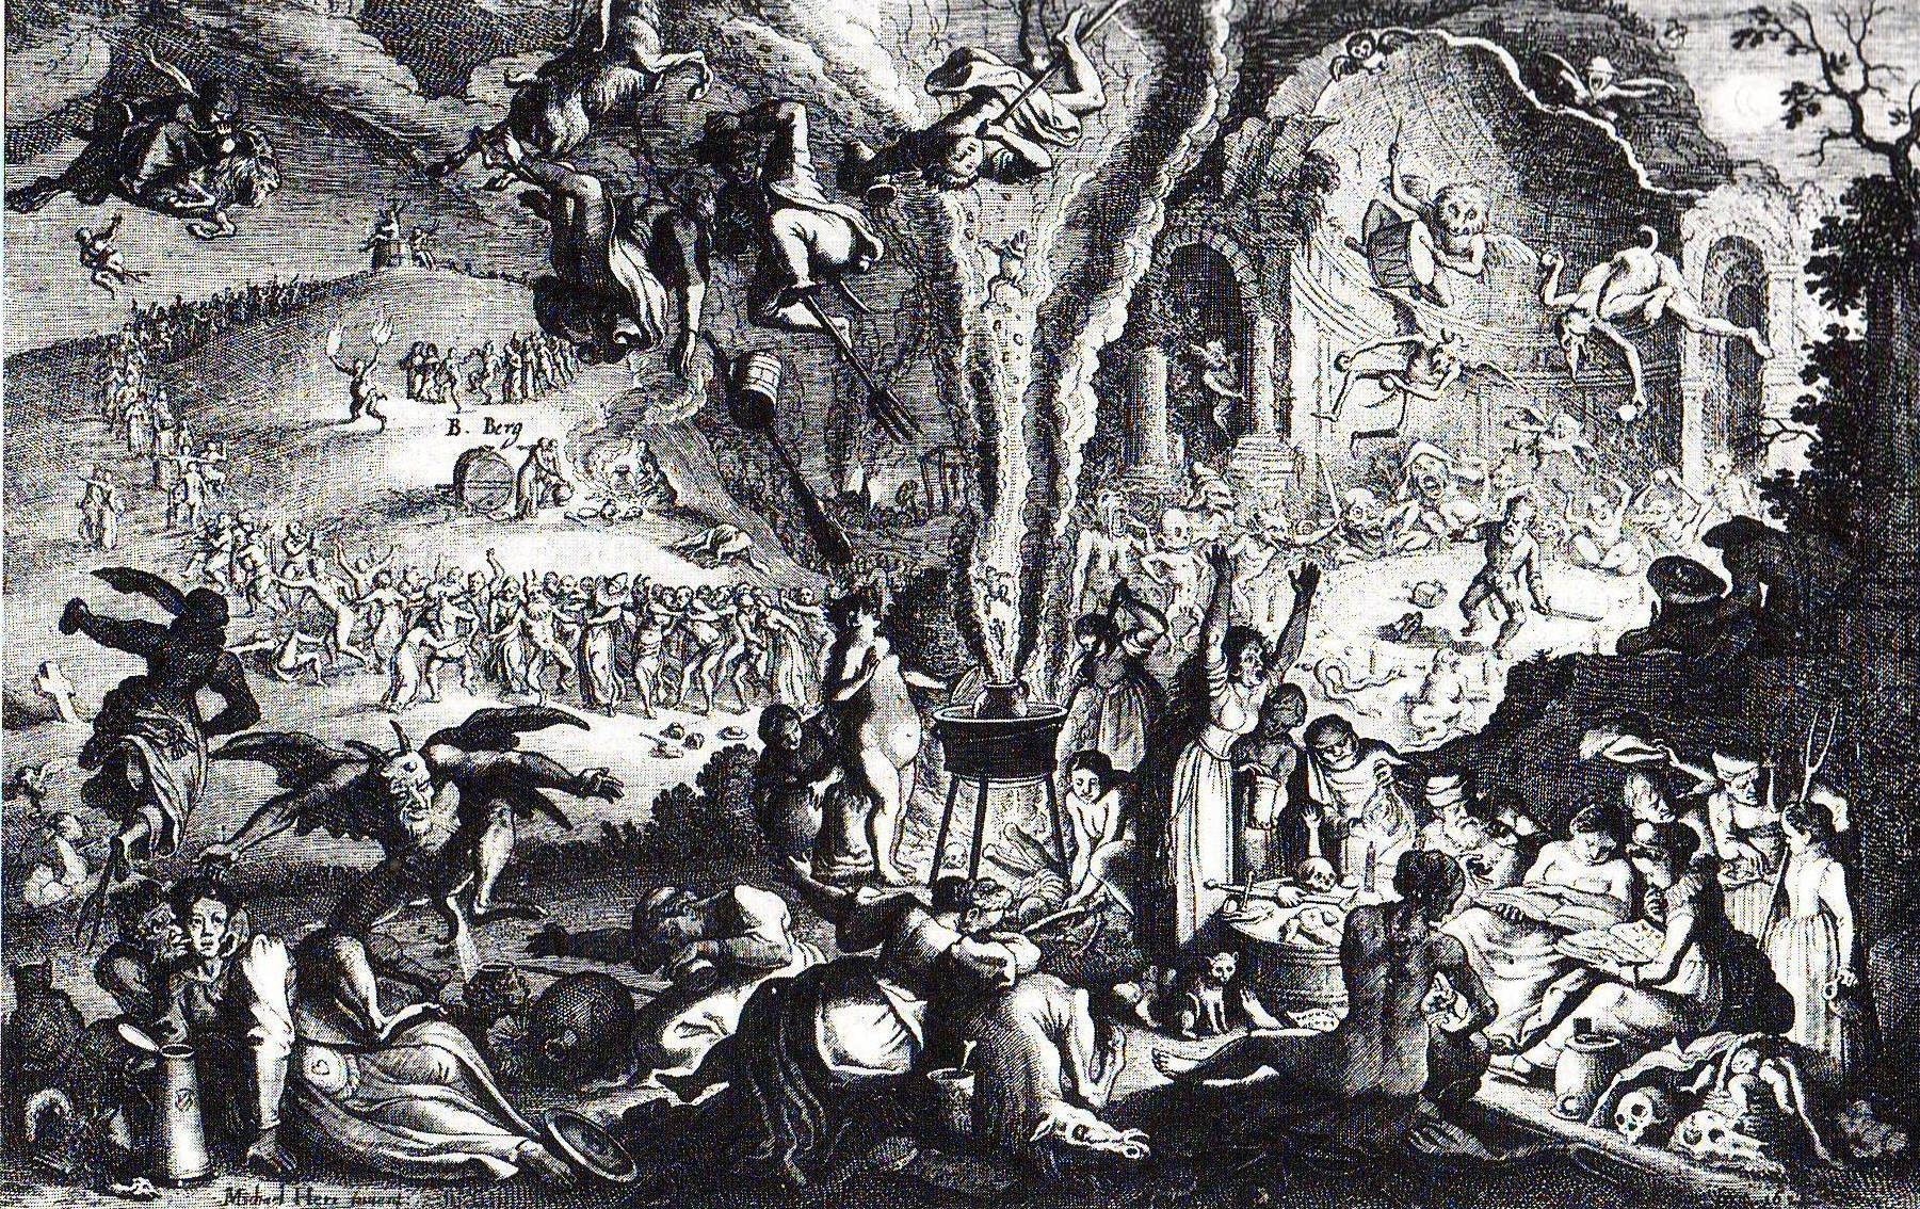 Sábado de brujas en el monte Brocken.Michael Herr / Wikimedia Commons